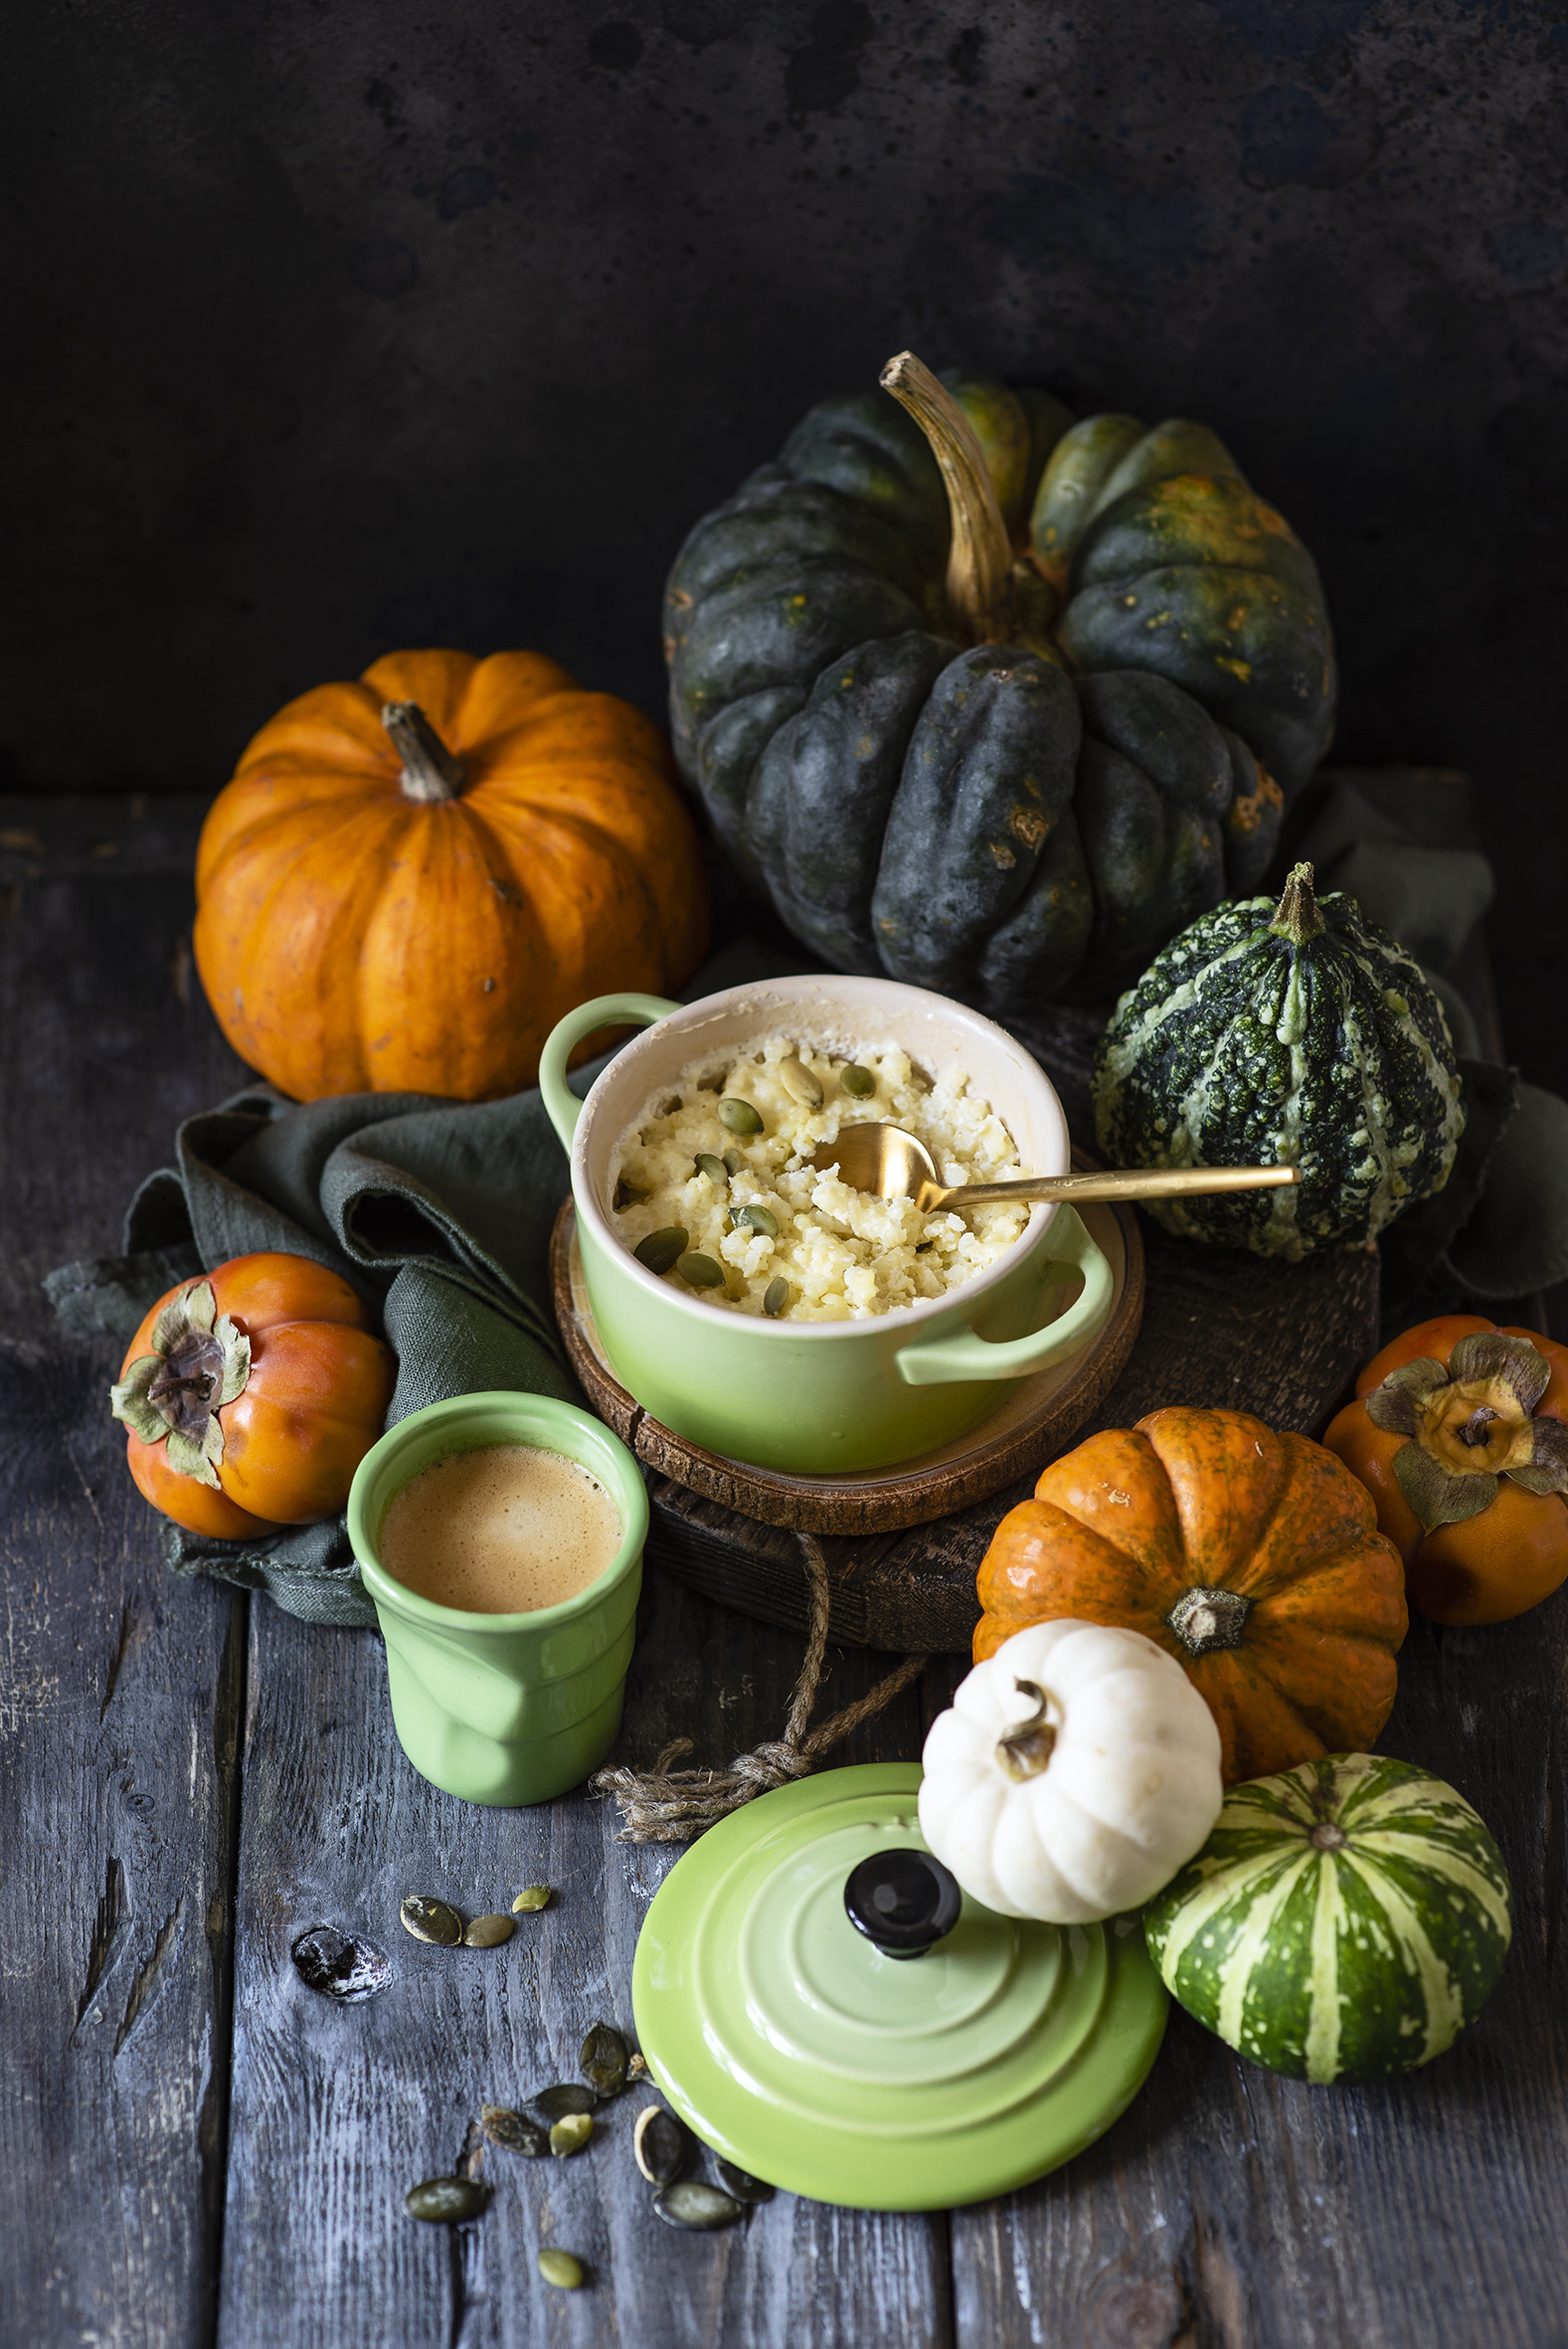 Pictures kaki Pumpkin Cappuccino Grain Highball glass Food Spoon Porridge Wood planks  for Mobile phone Persimmon boards